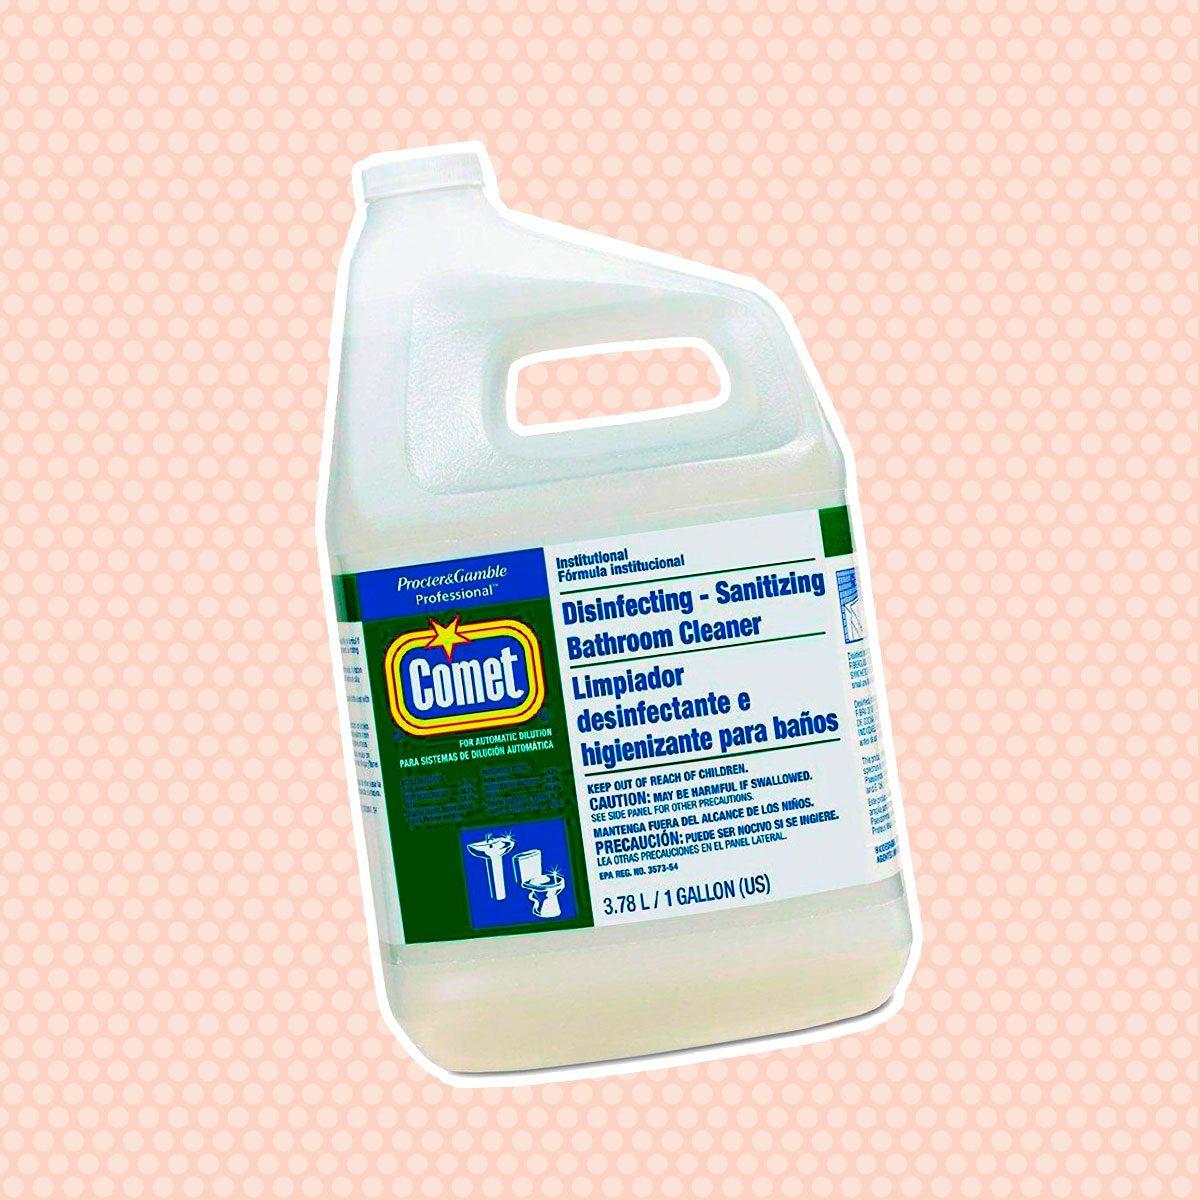 Comet 22570EA Disinfecting-Sanitizing Bathroom Cleaner, One Gallon Bottle